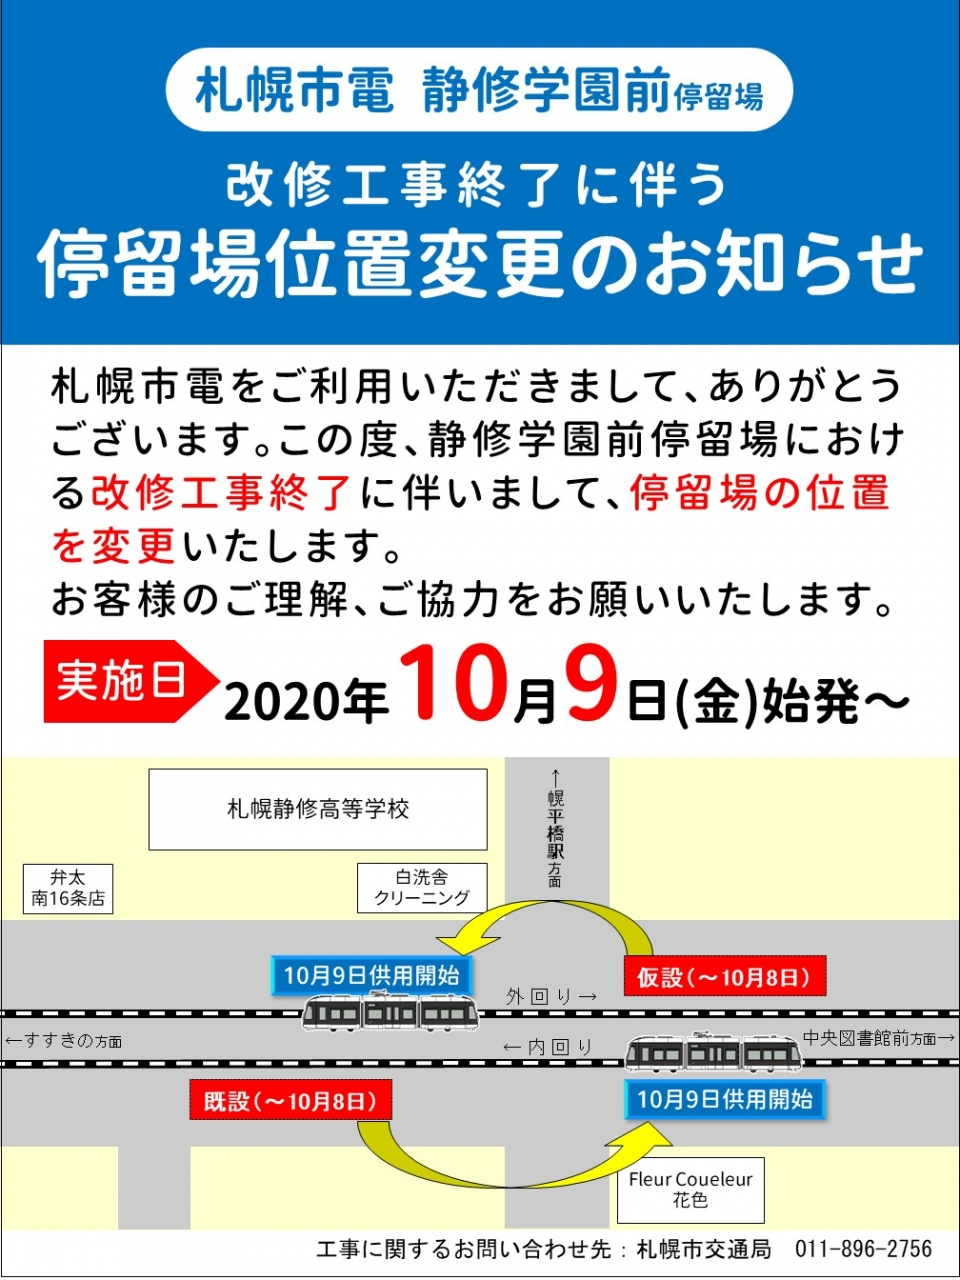 2020 jr 東海 冬 ボーナス